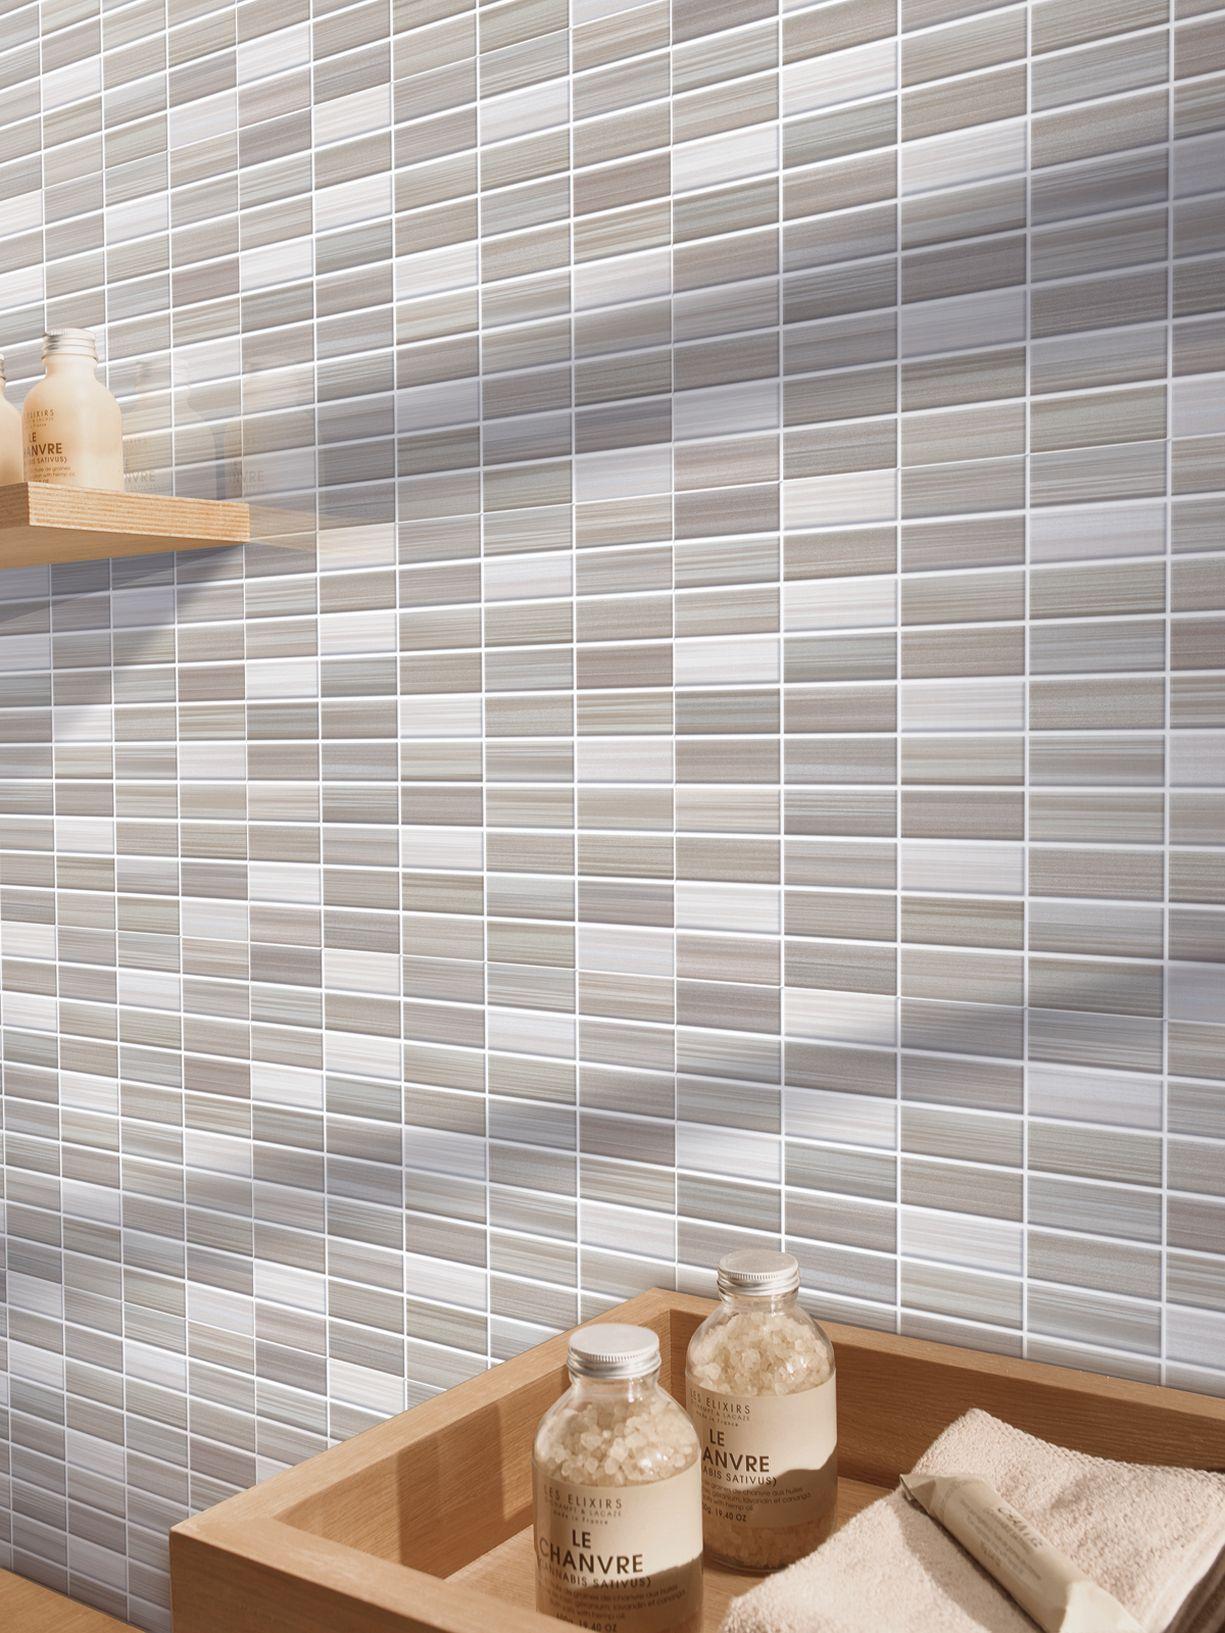 Piastrelle mosaico cucina semplice e comfort in una casa - Piastrelle mosaico cucina ...